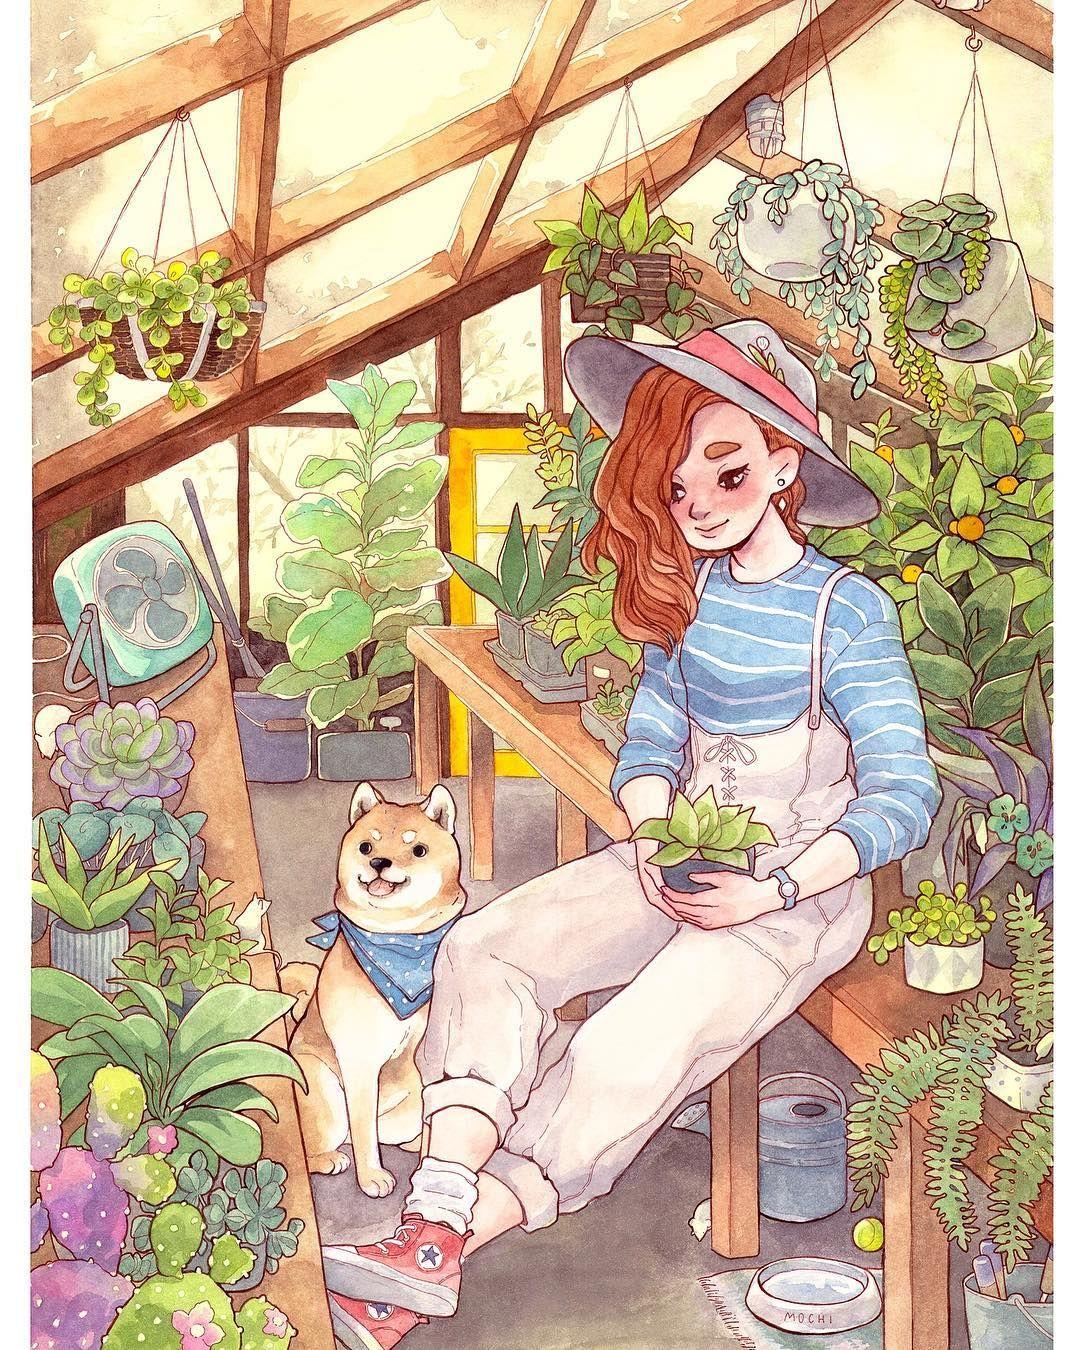 Green House Illustration by Alisa Vysochina